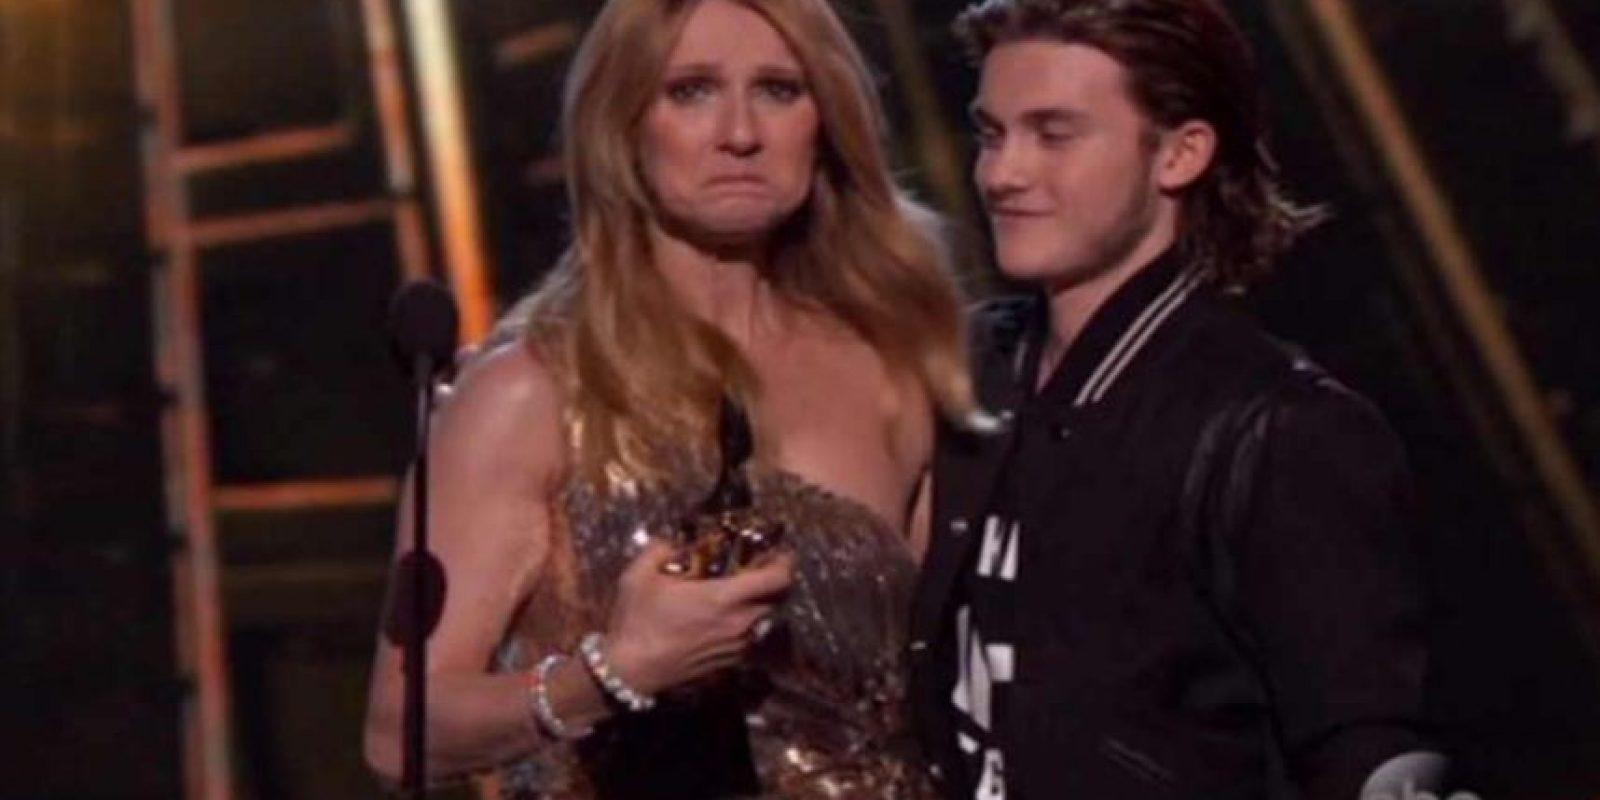 Celine Dion rompió en llanto por la sorpresa Foto:Twitter